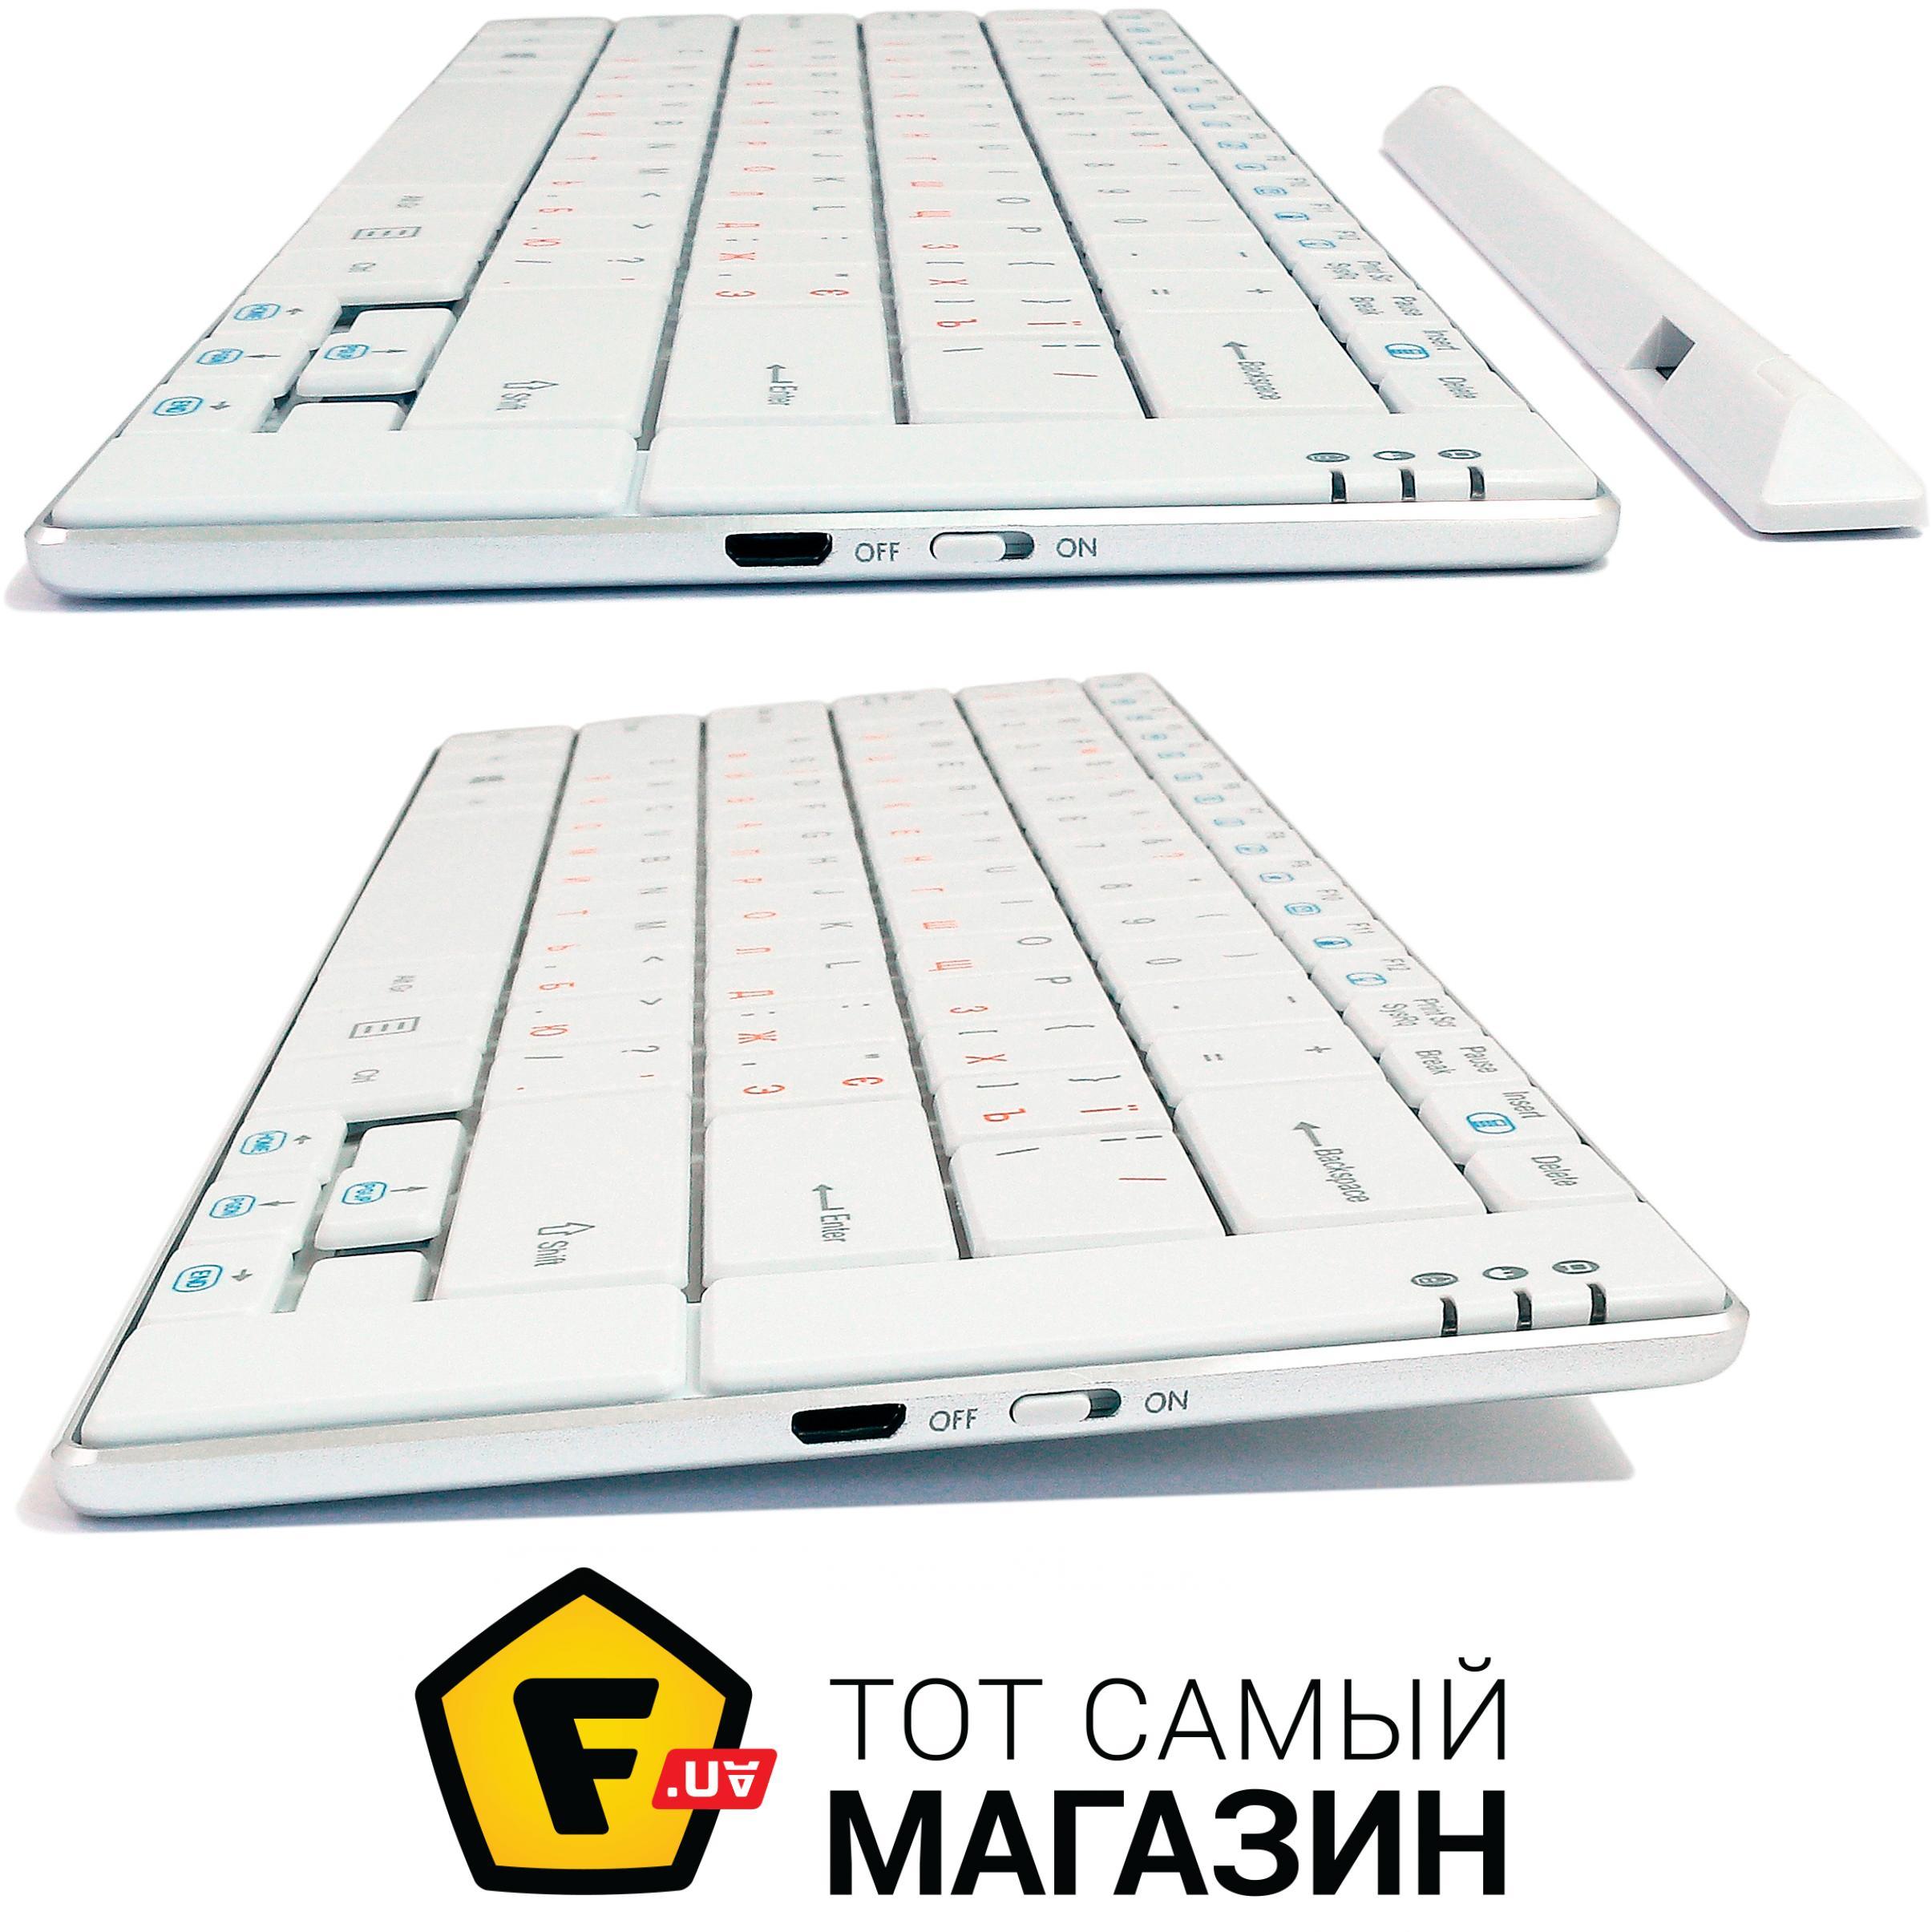 (M7J-00012) Клавиатура + Мышь Microsoft Wireless Desktop 2000 USB Retail